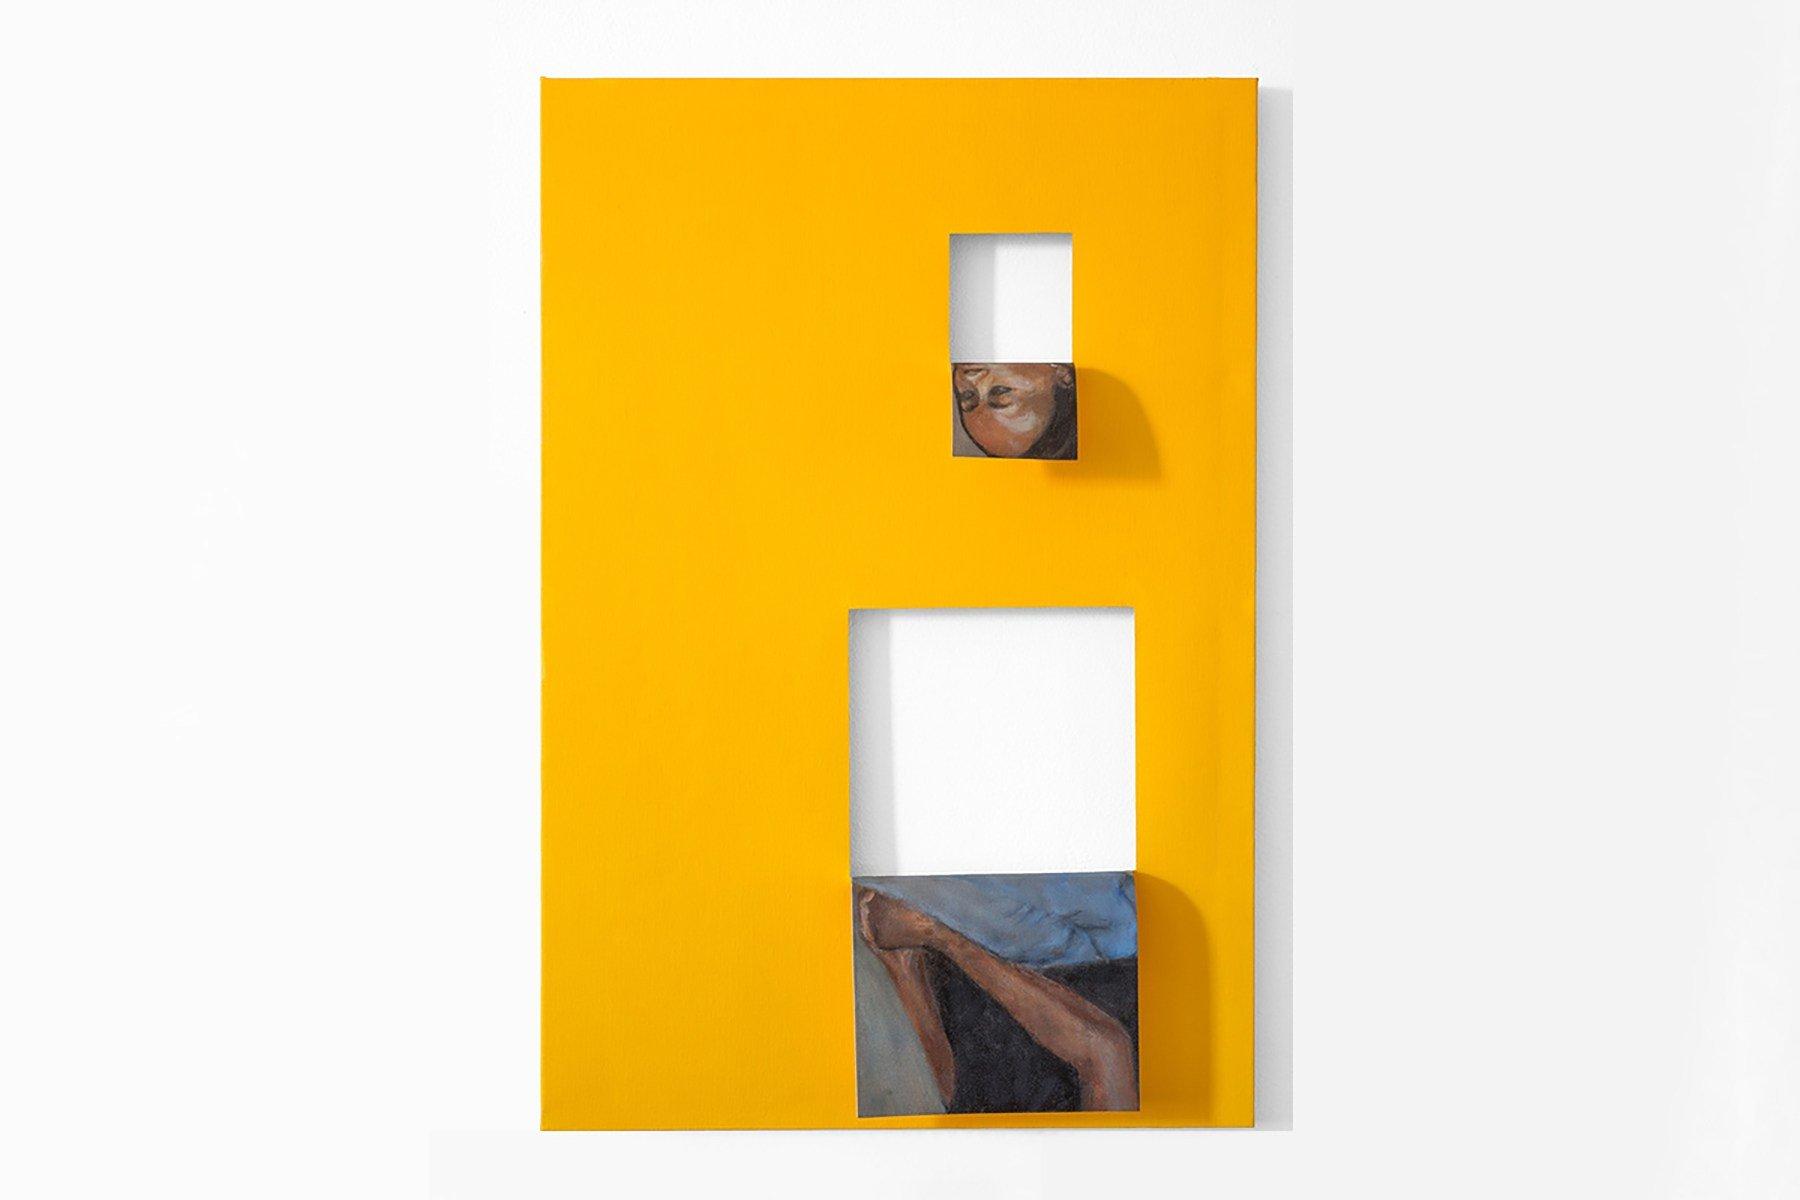 IGNANT-Art-Valeska-Soares-Doubleface-6